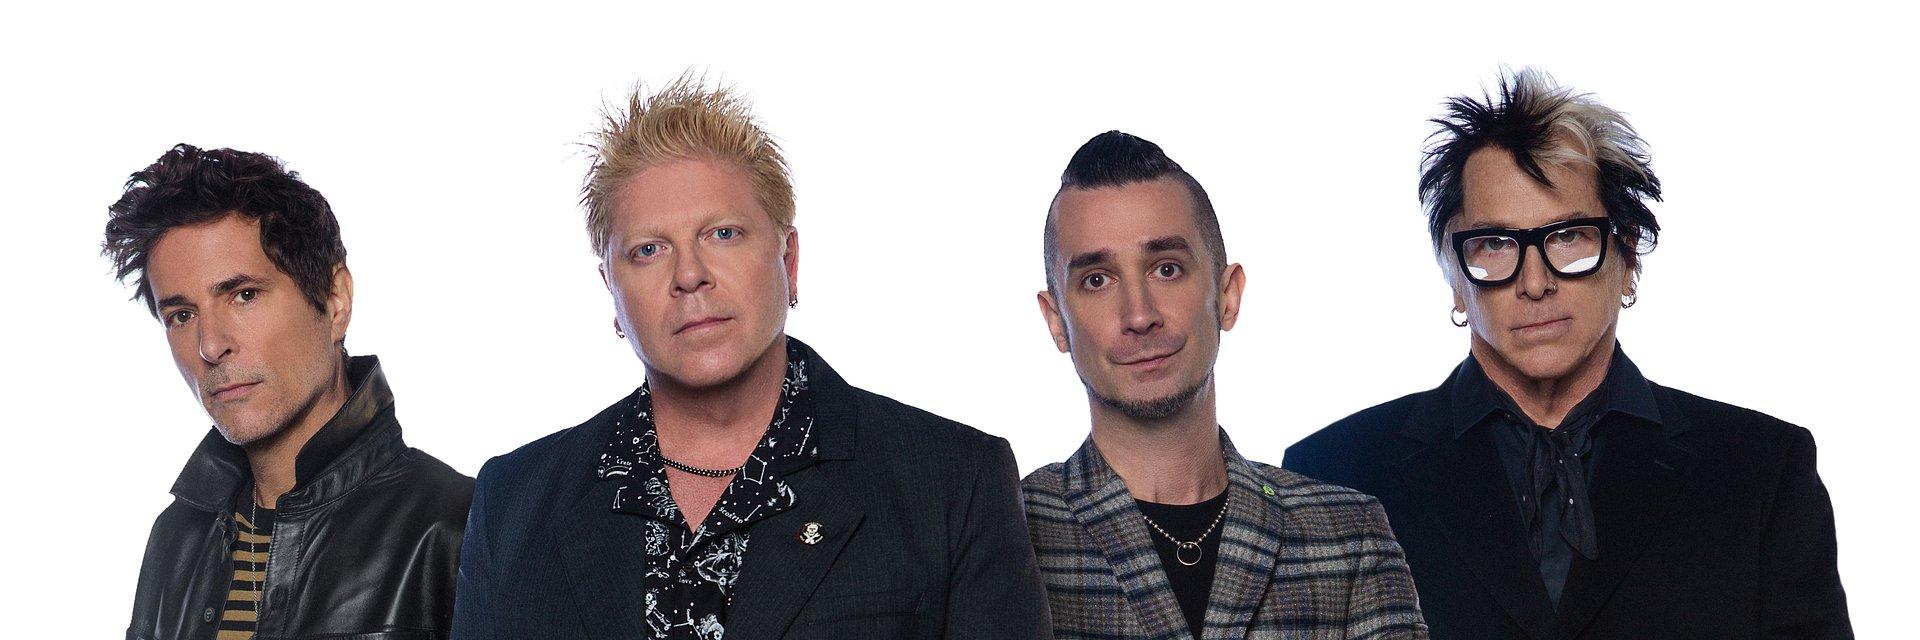 "The Offspring z surrealistycznym klipem do ""Let The Bad Times Roll"""